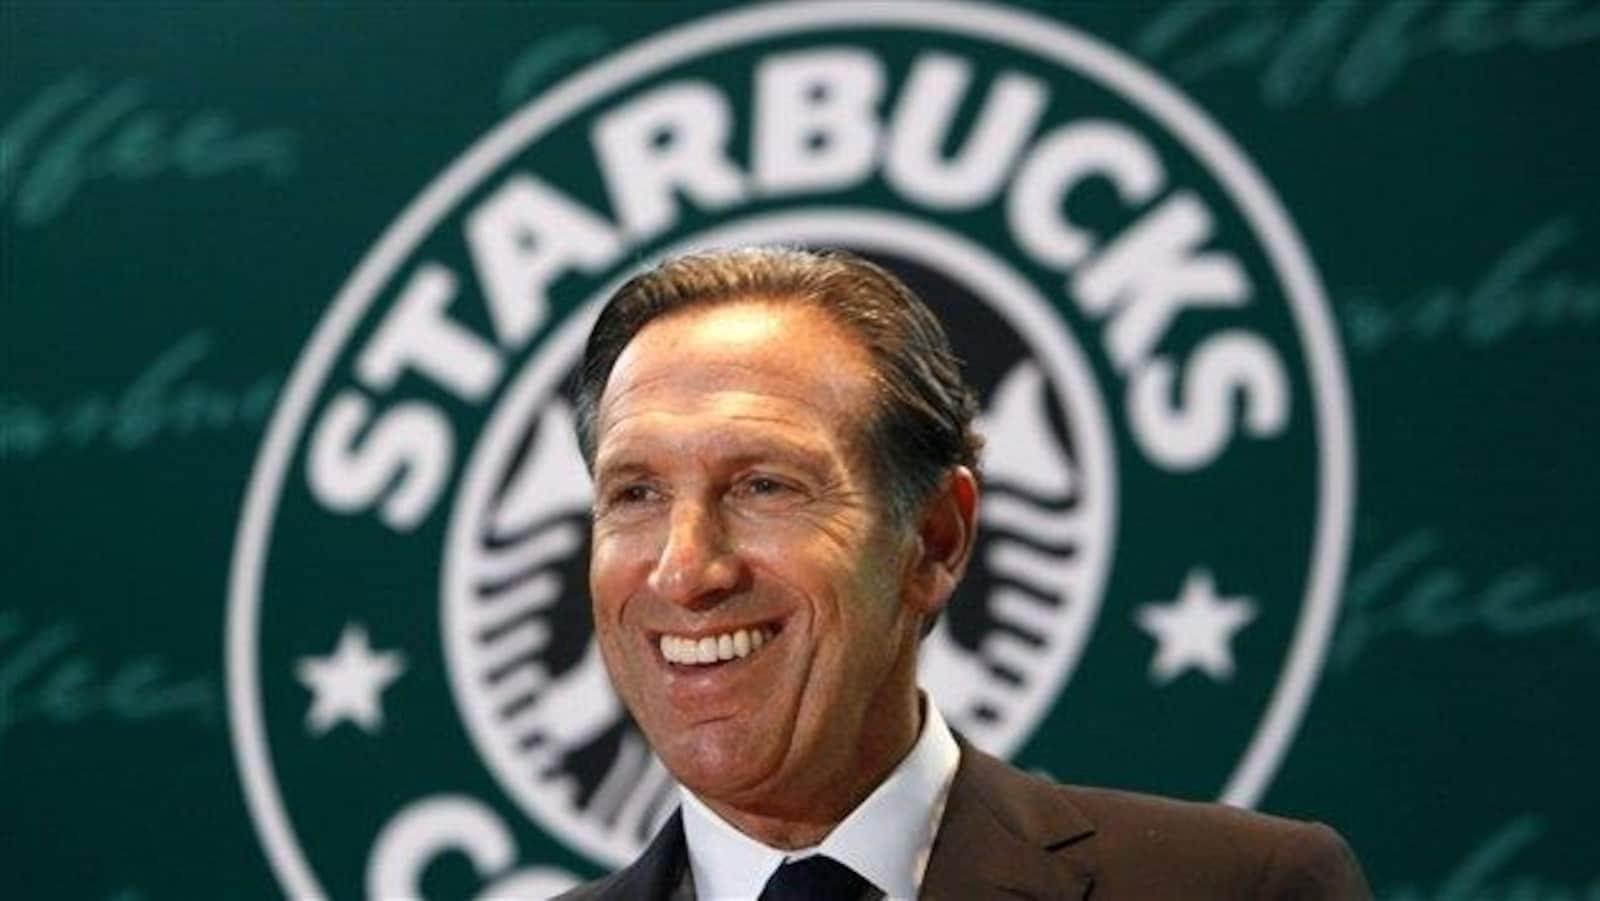 Le président exécutif de Starbucks, Howard Schultz.